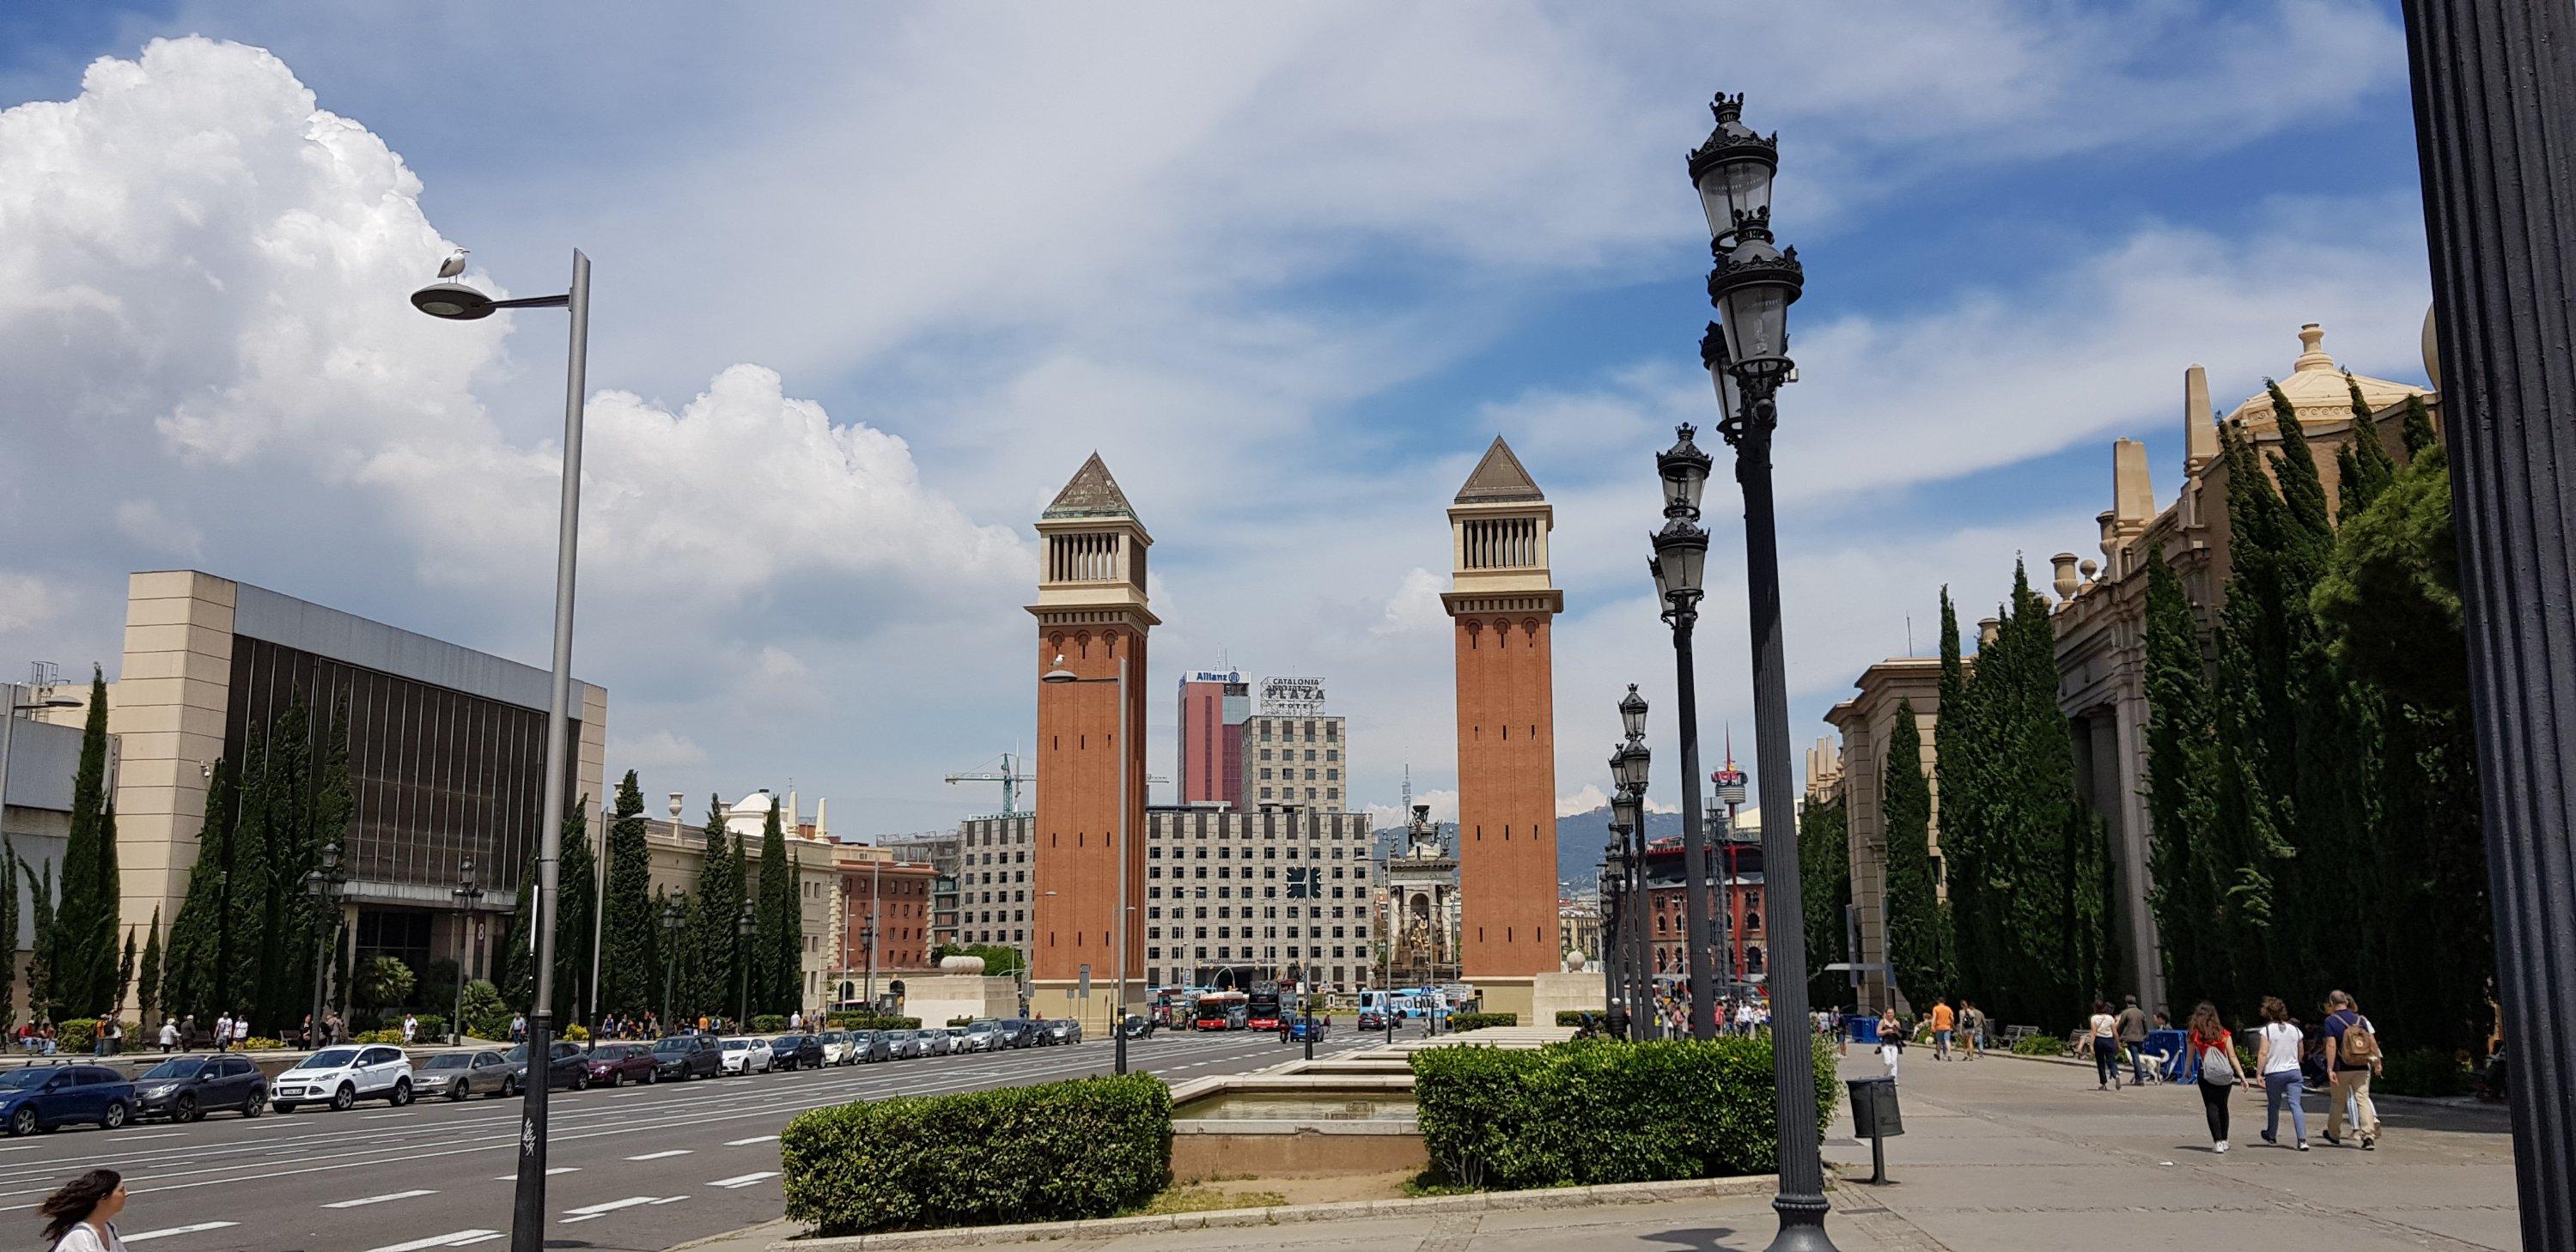 Placa d´Espanya in Barcelona